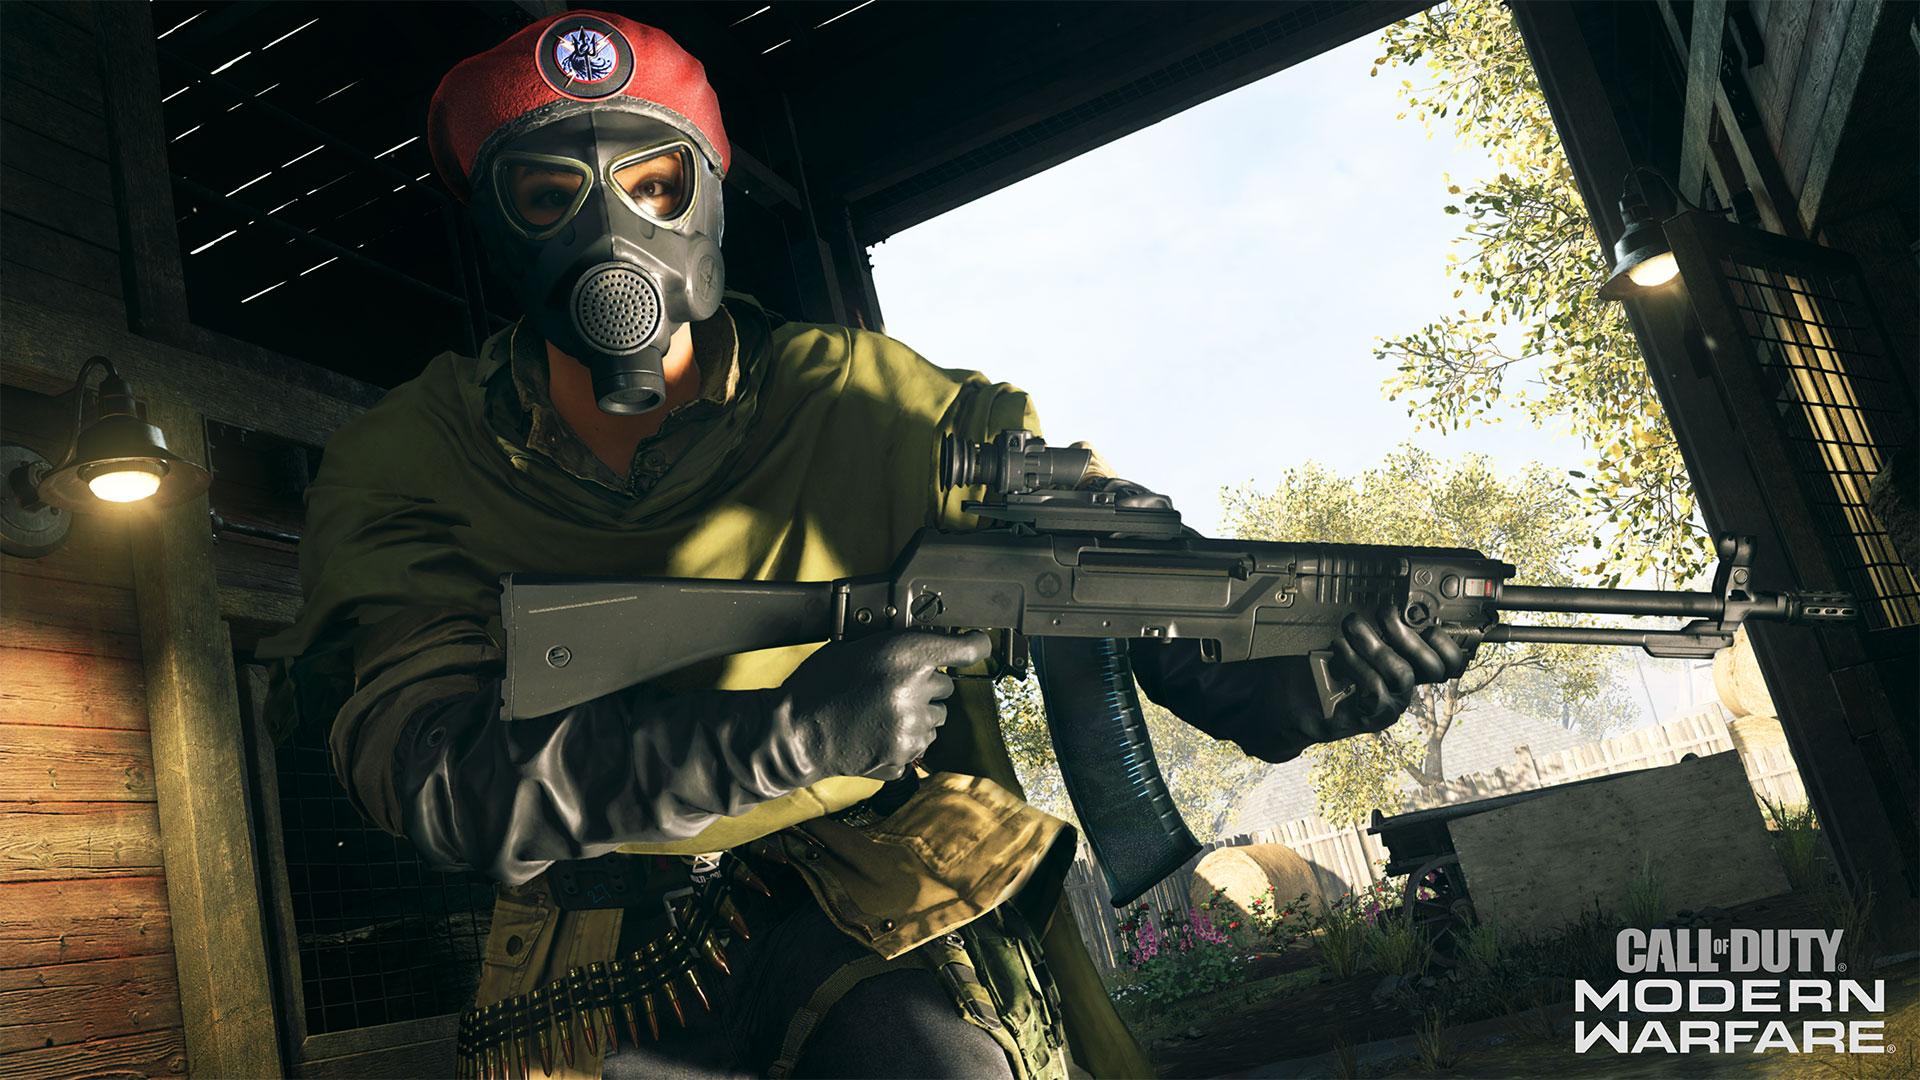 Season Five Of Call Of Duty Modern Warfare Expands Warzone